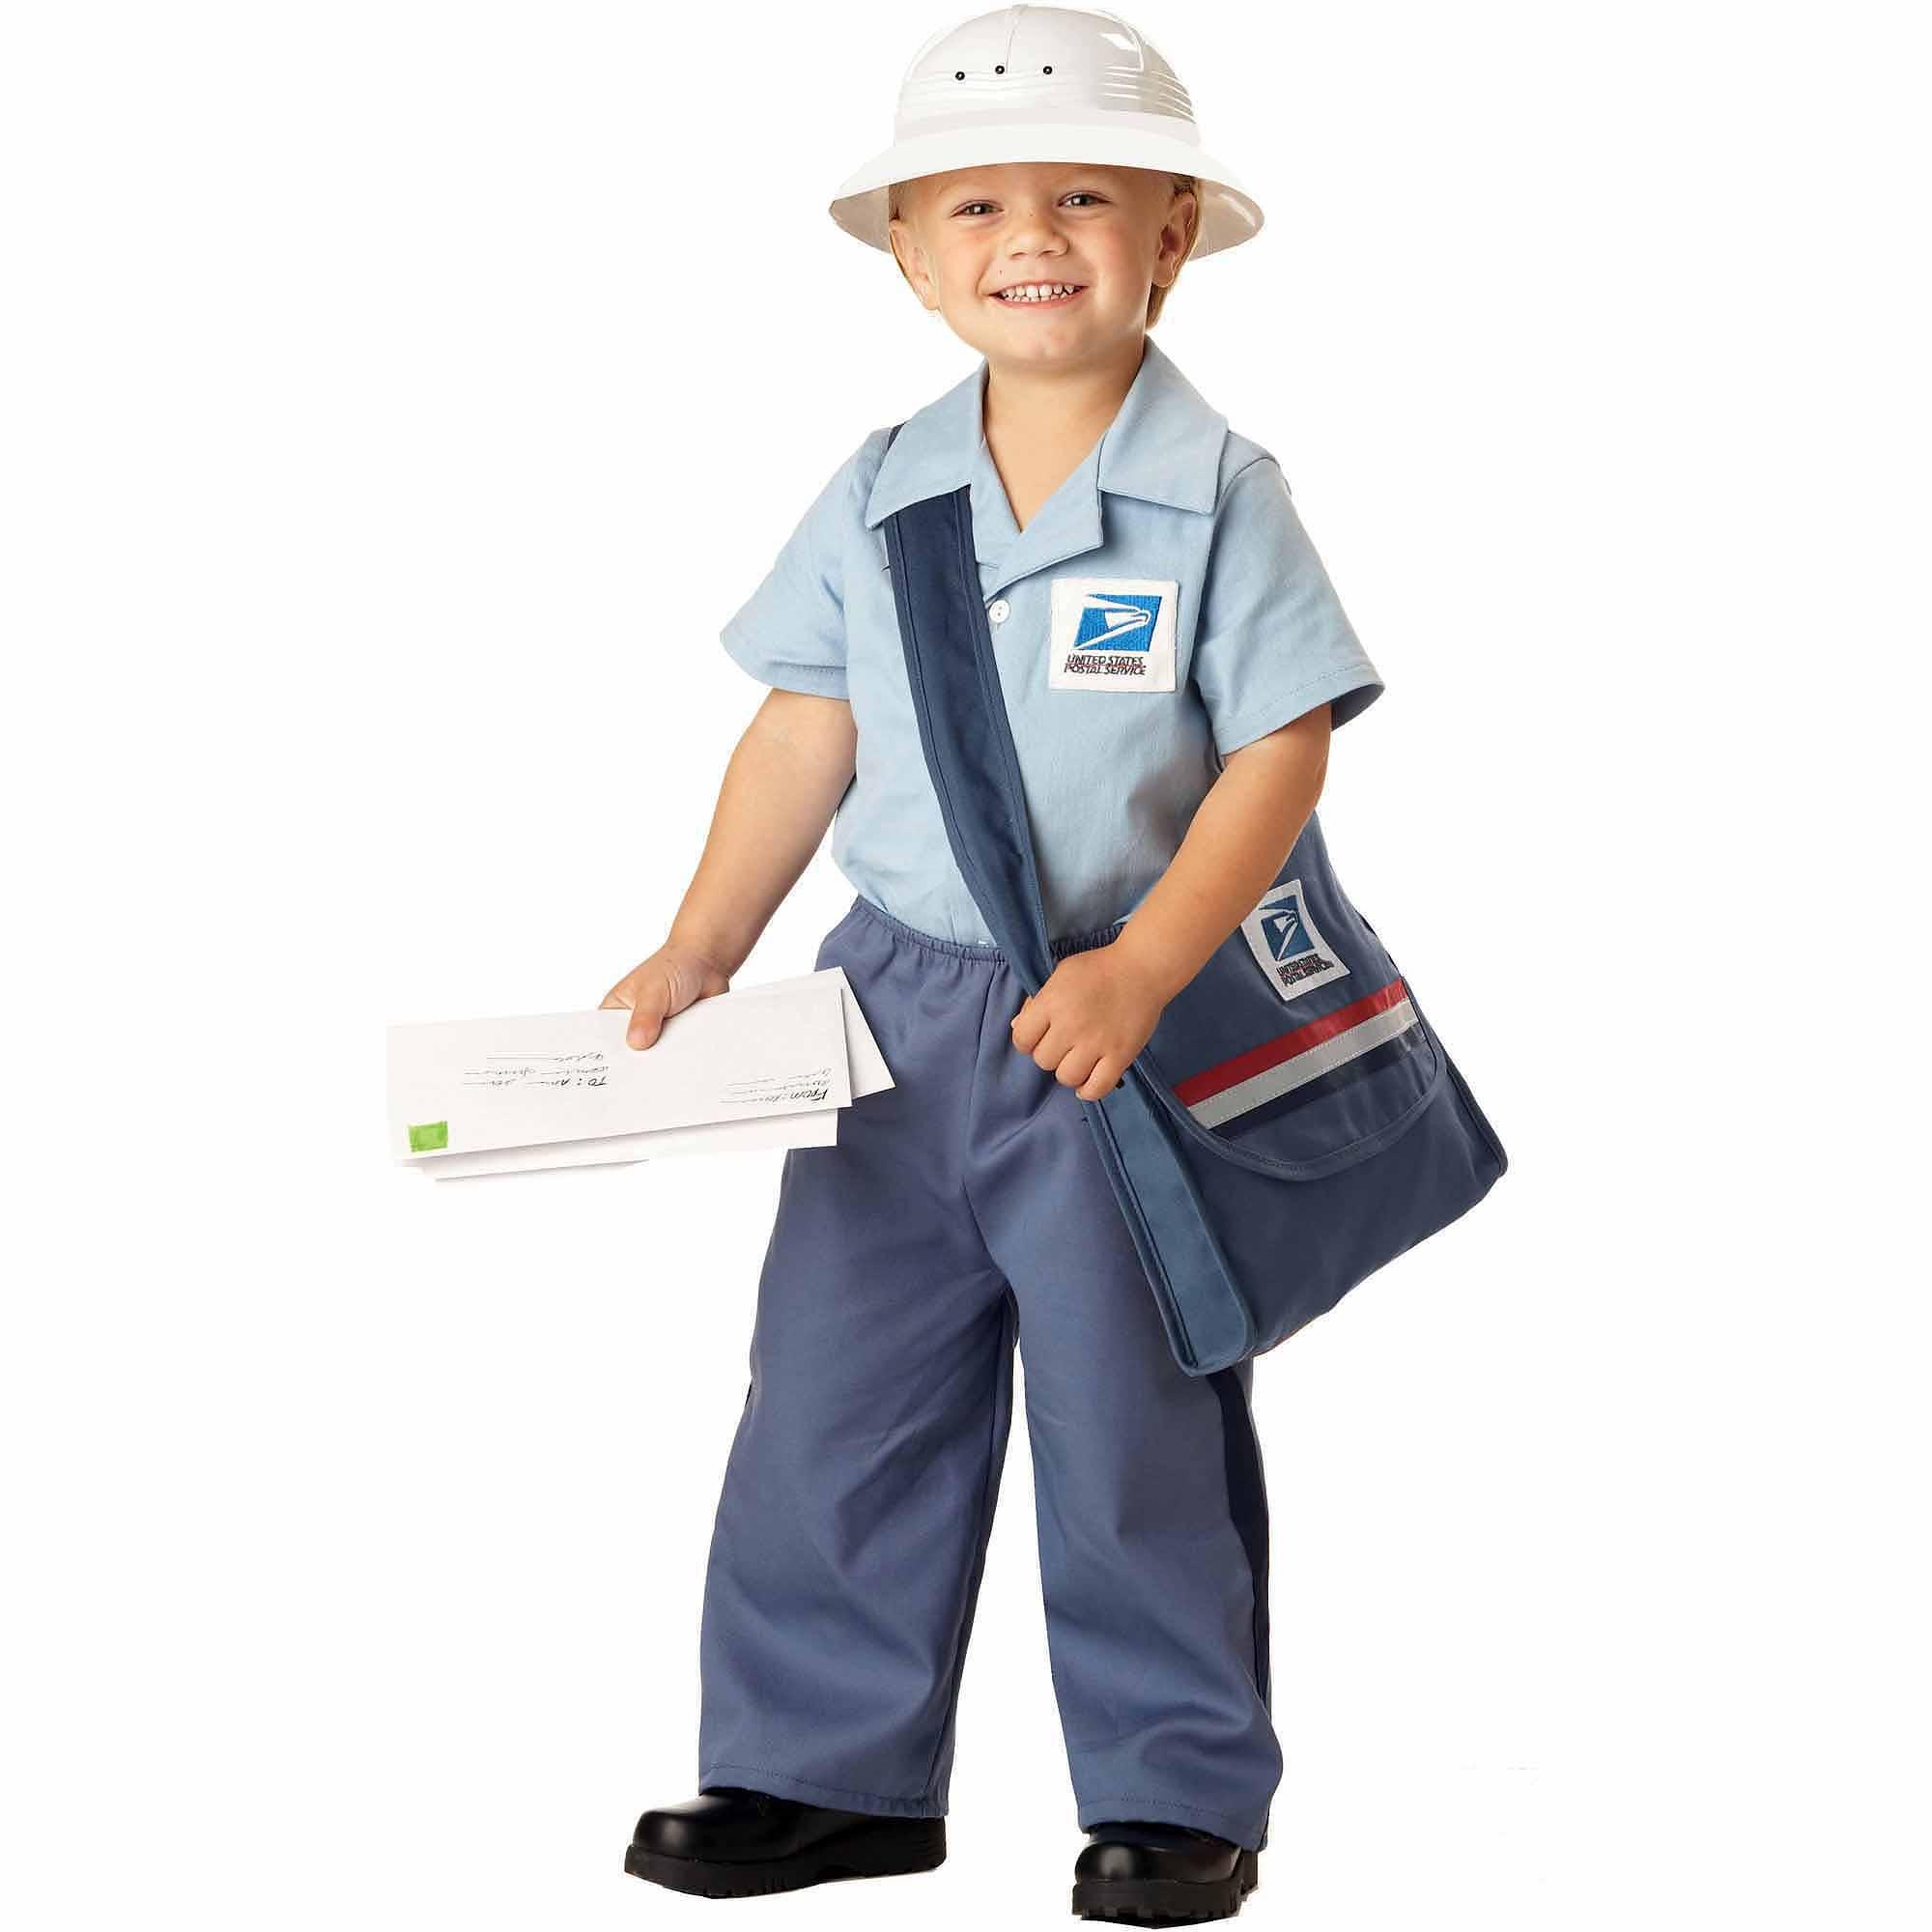 Mr. Postman Toddler Halloween Costume, Size 3T-4T - Walmart.com